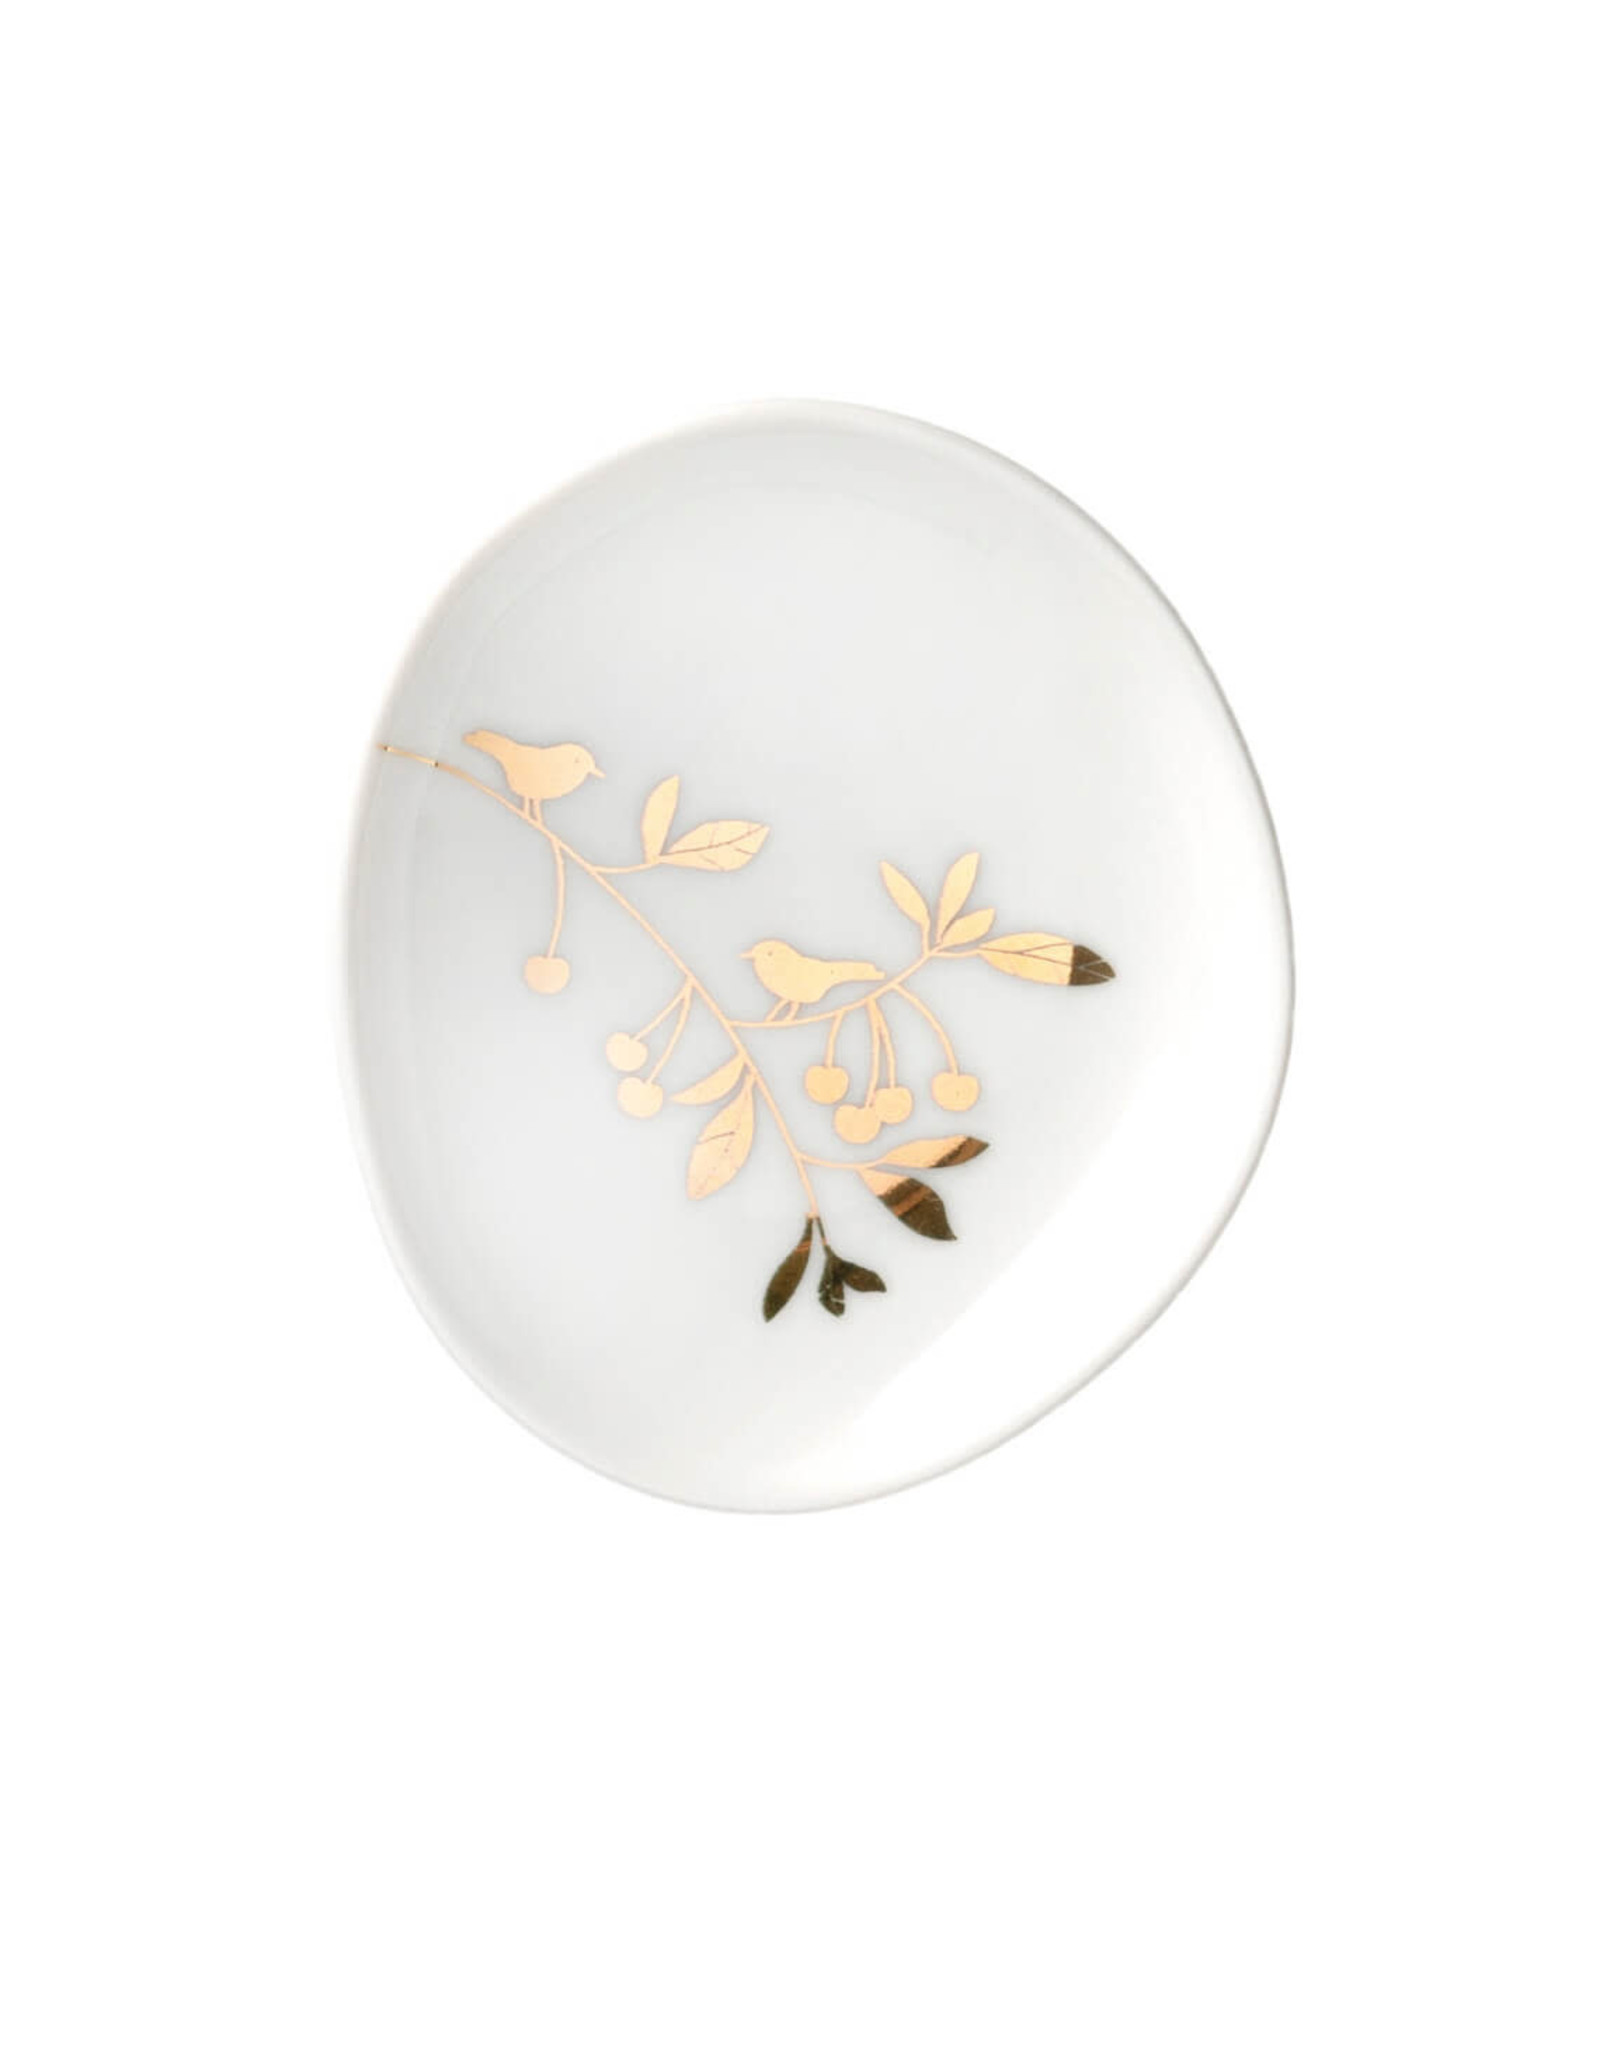 Raeder Bord Wonderland - 3st - Gouden bloemen en olifant - 9x5,5cm tot 11x11cm